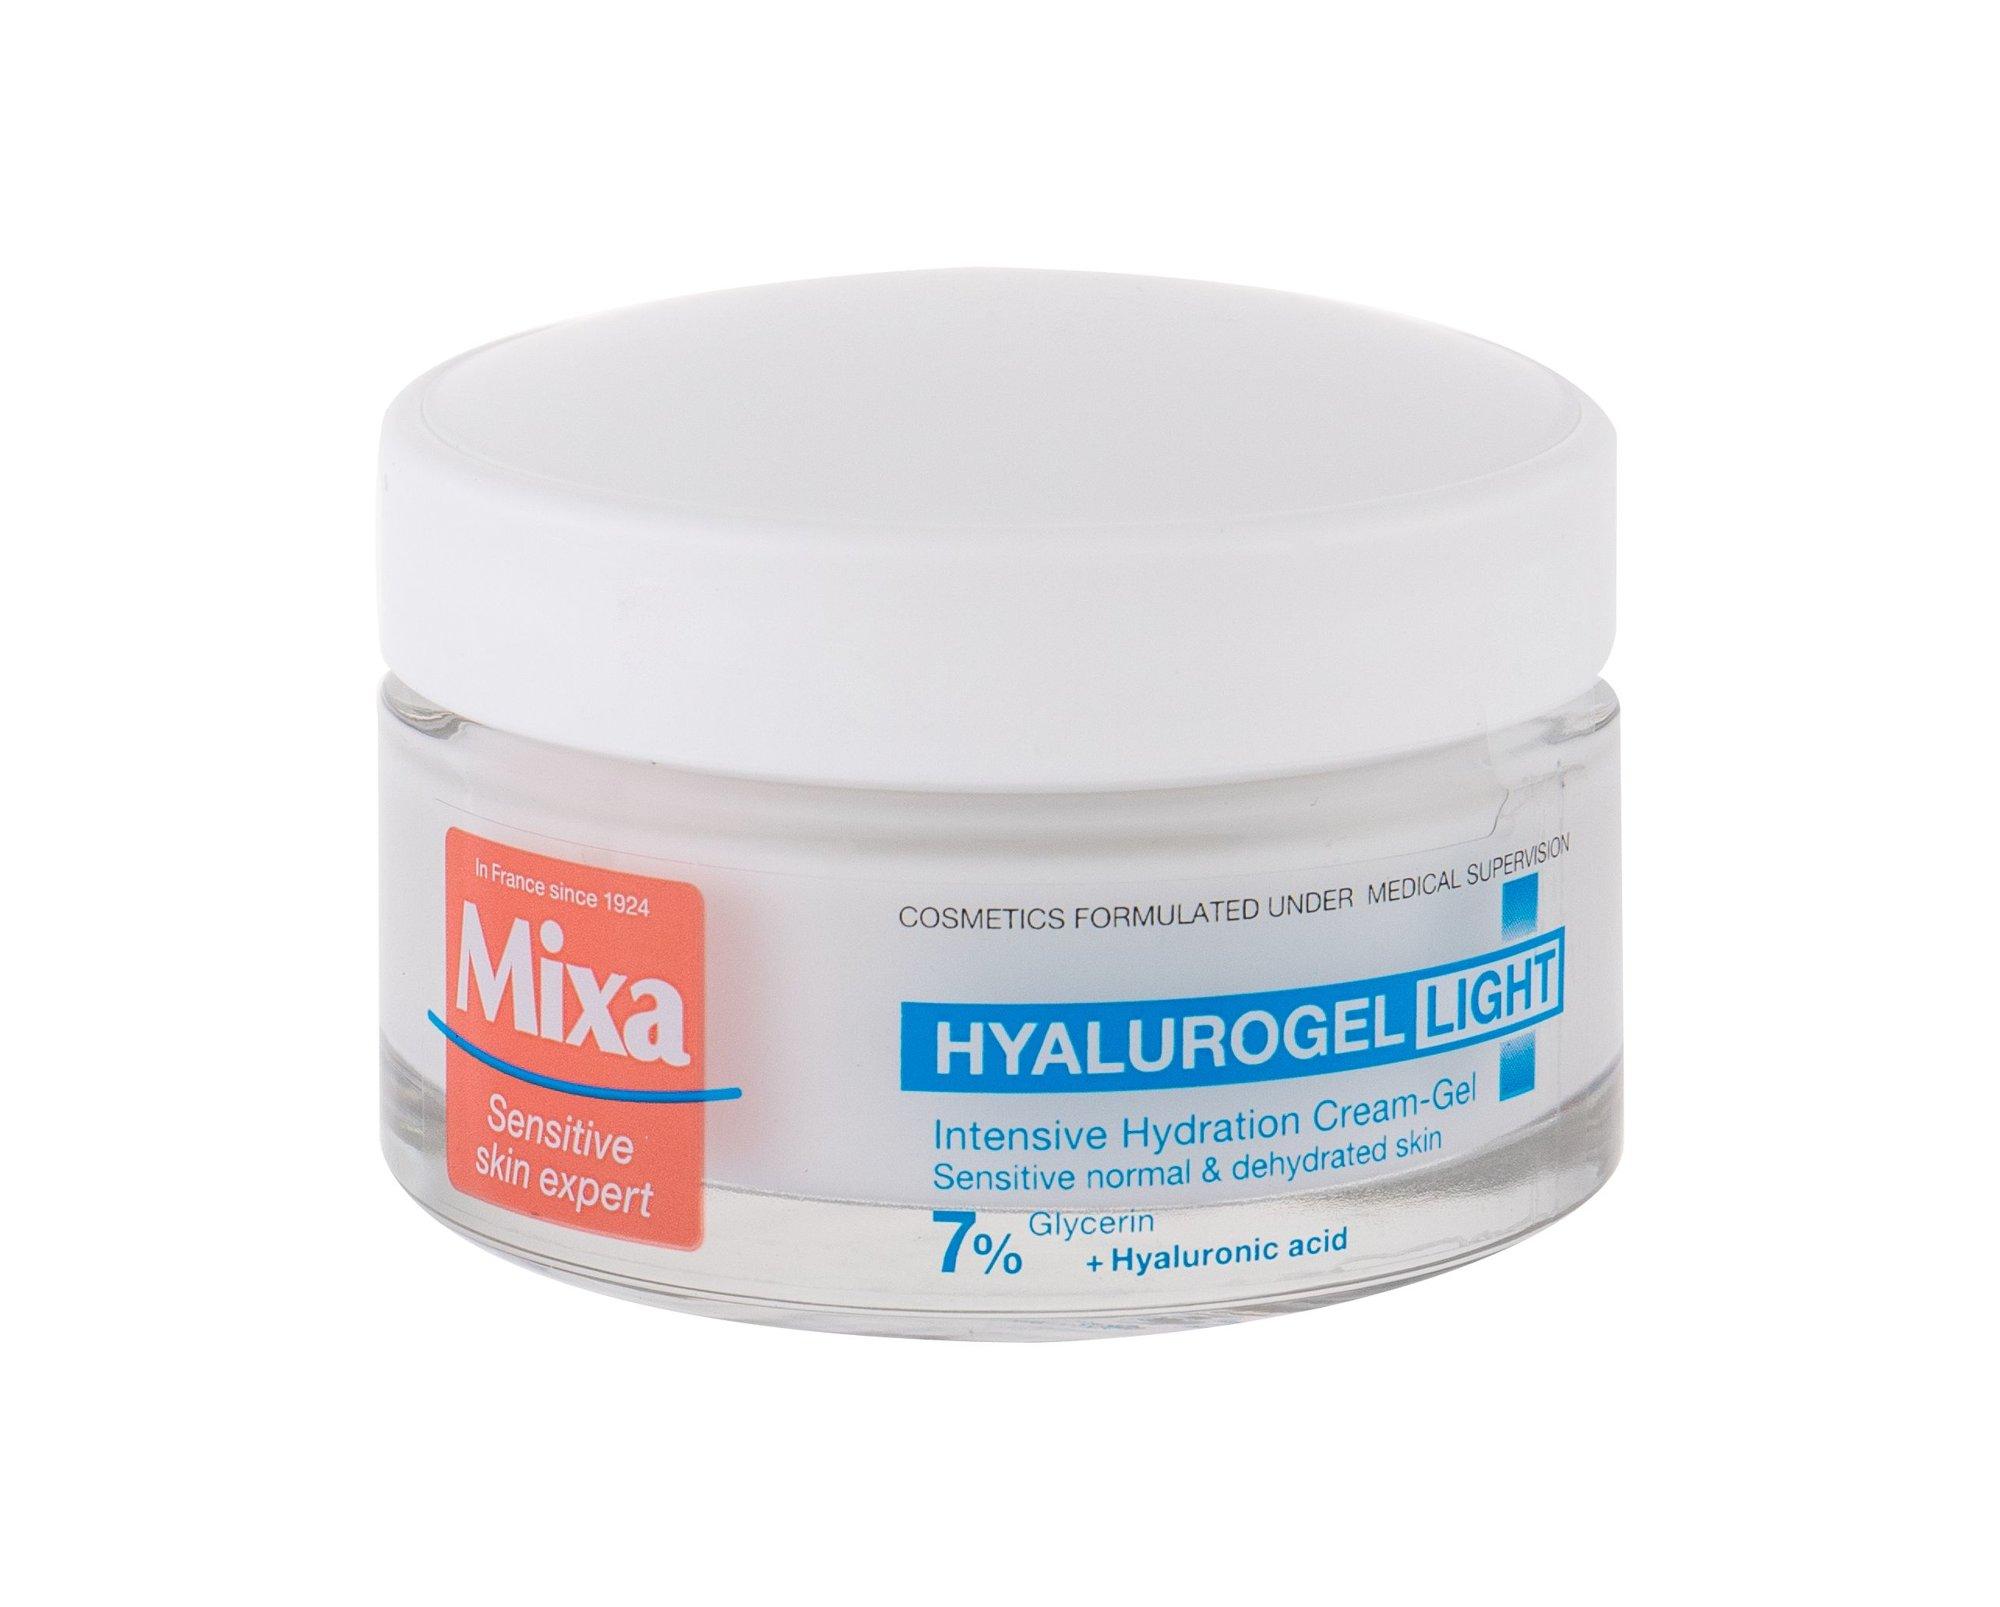 Mixa Hyalurogel Day Cream 50ml